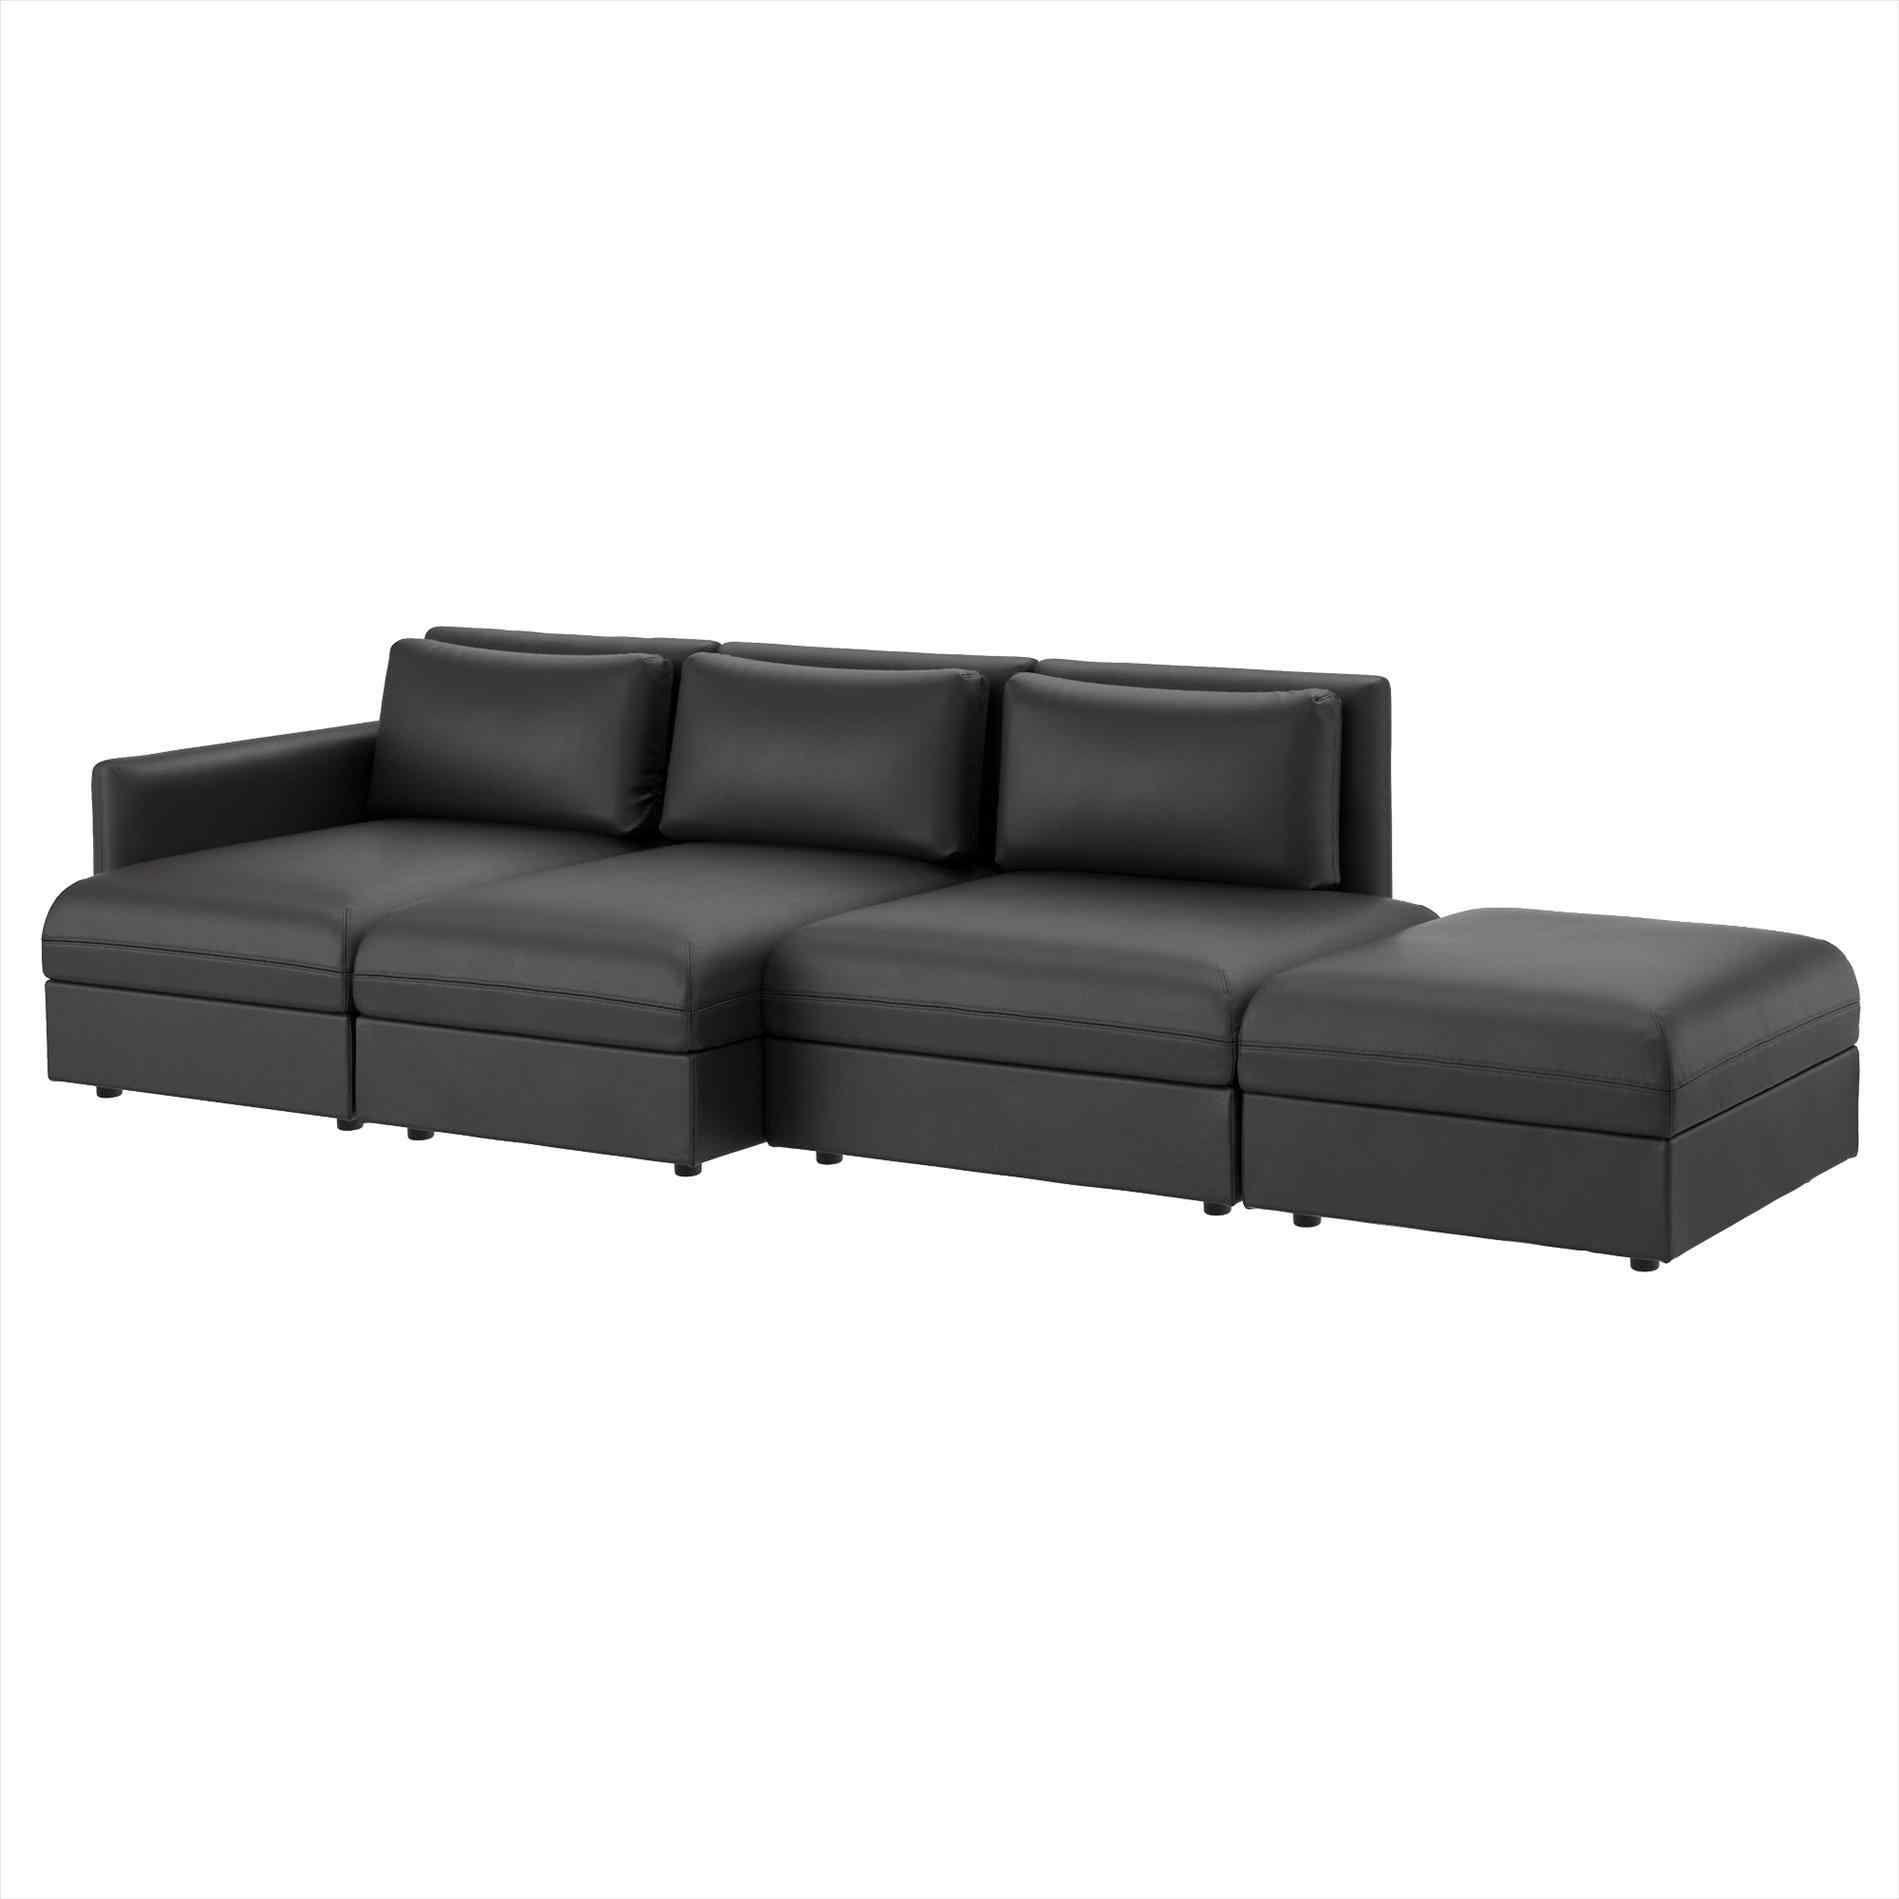 Dollars Along Modest Article Lotusepcom S Sectional Sofa Under 500